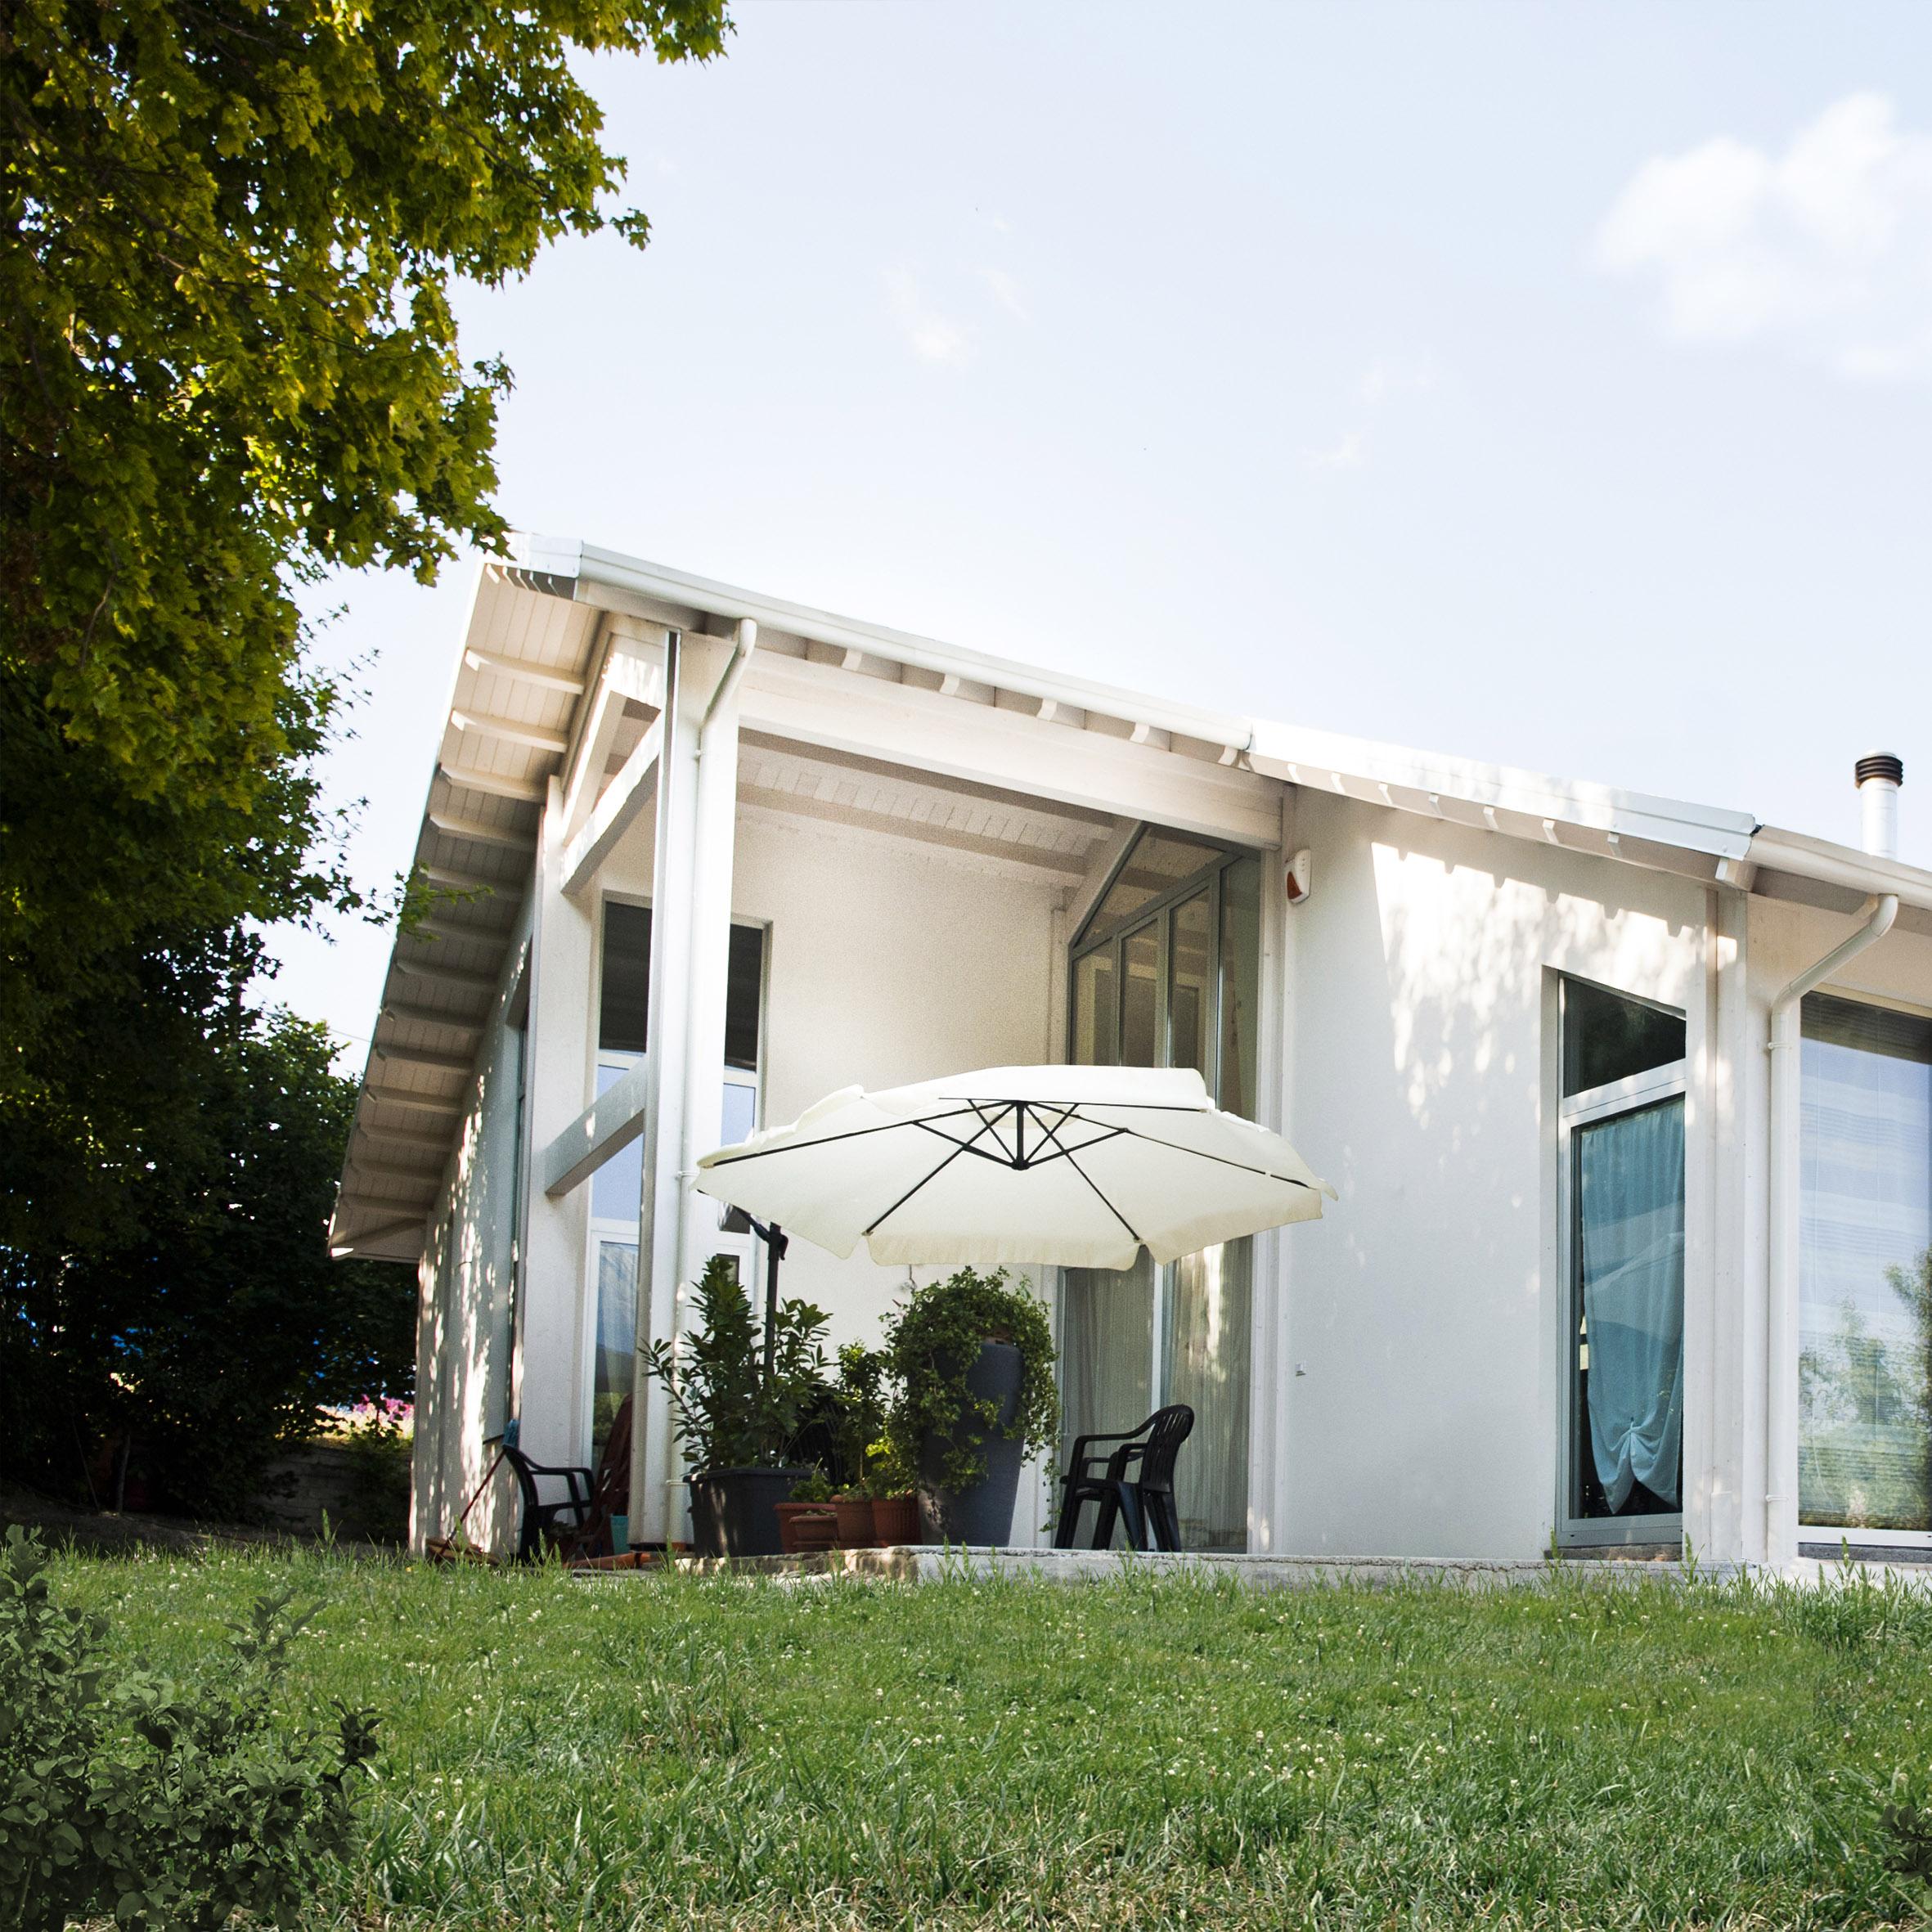 Casa monofamiliare a telaio